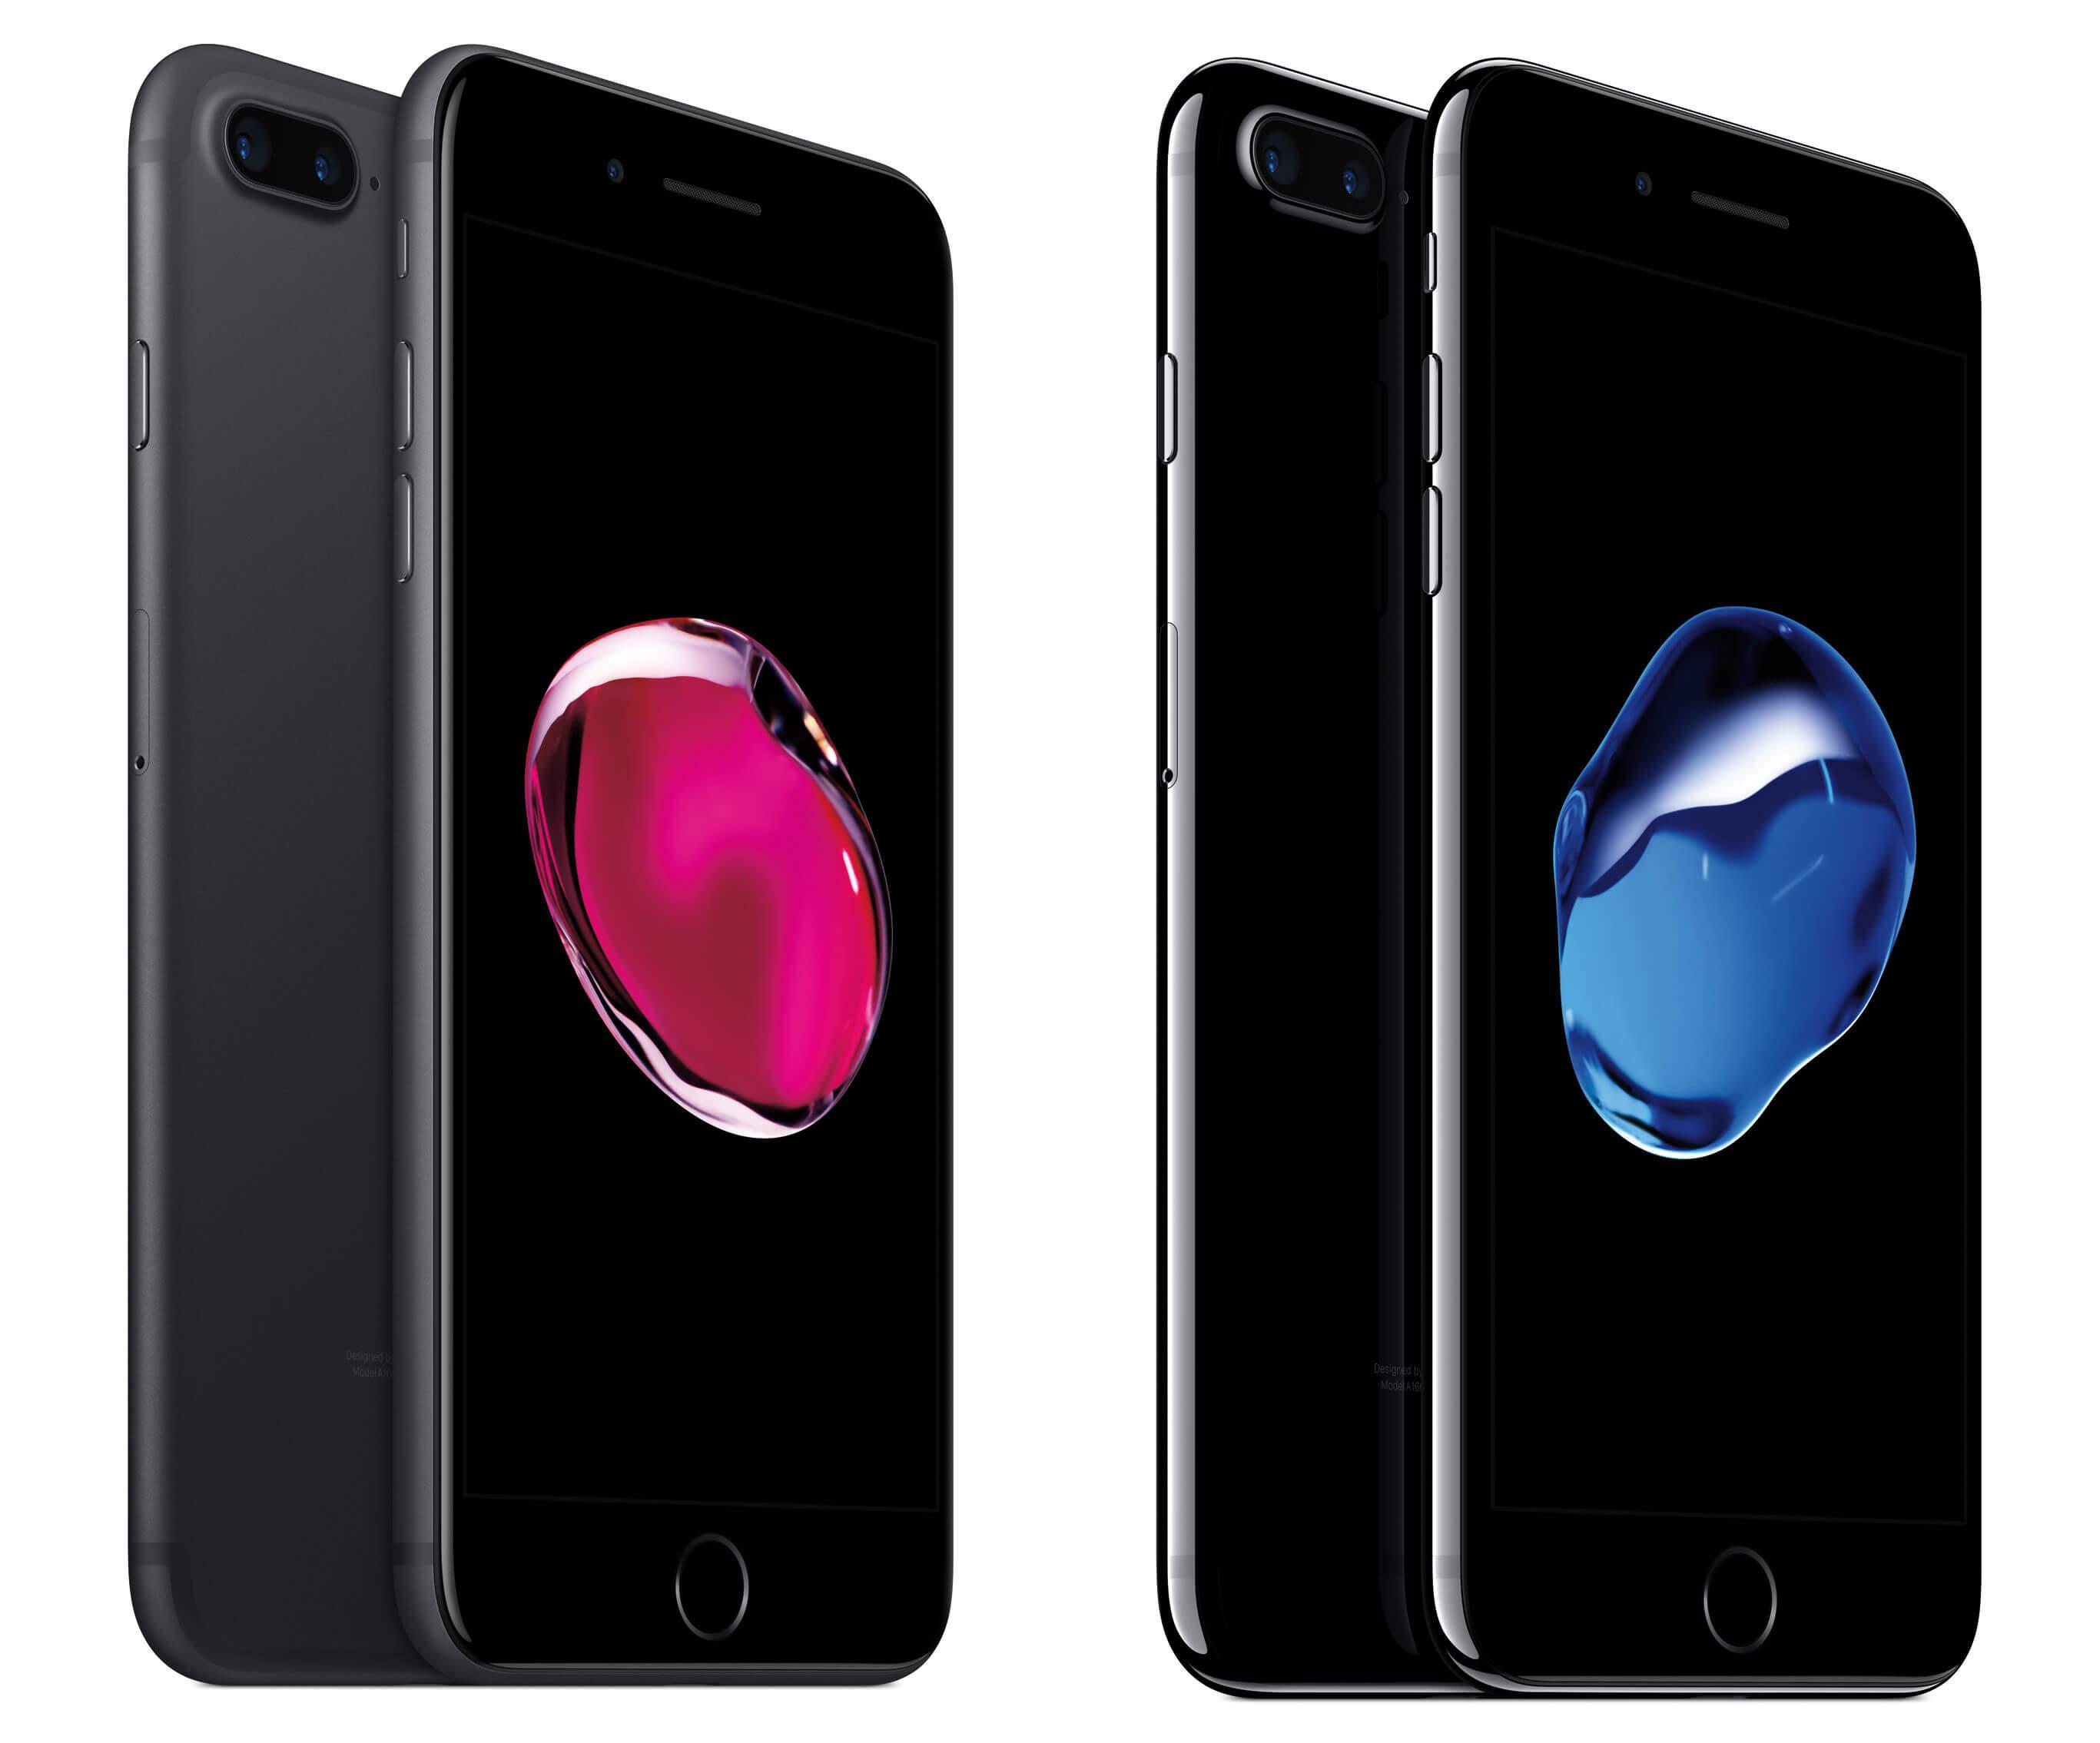 Iphone 7 plus какой цвет лучше